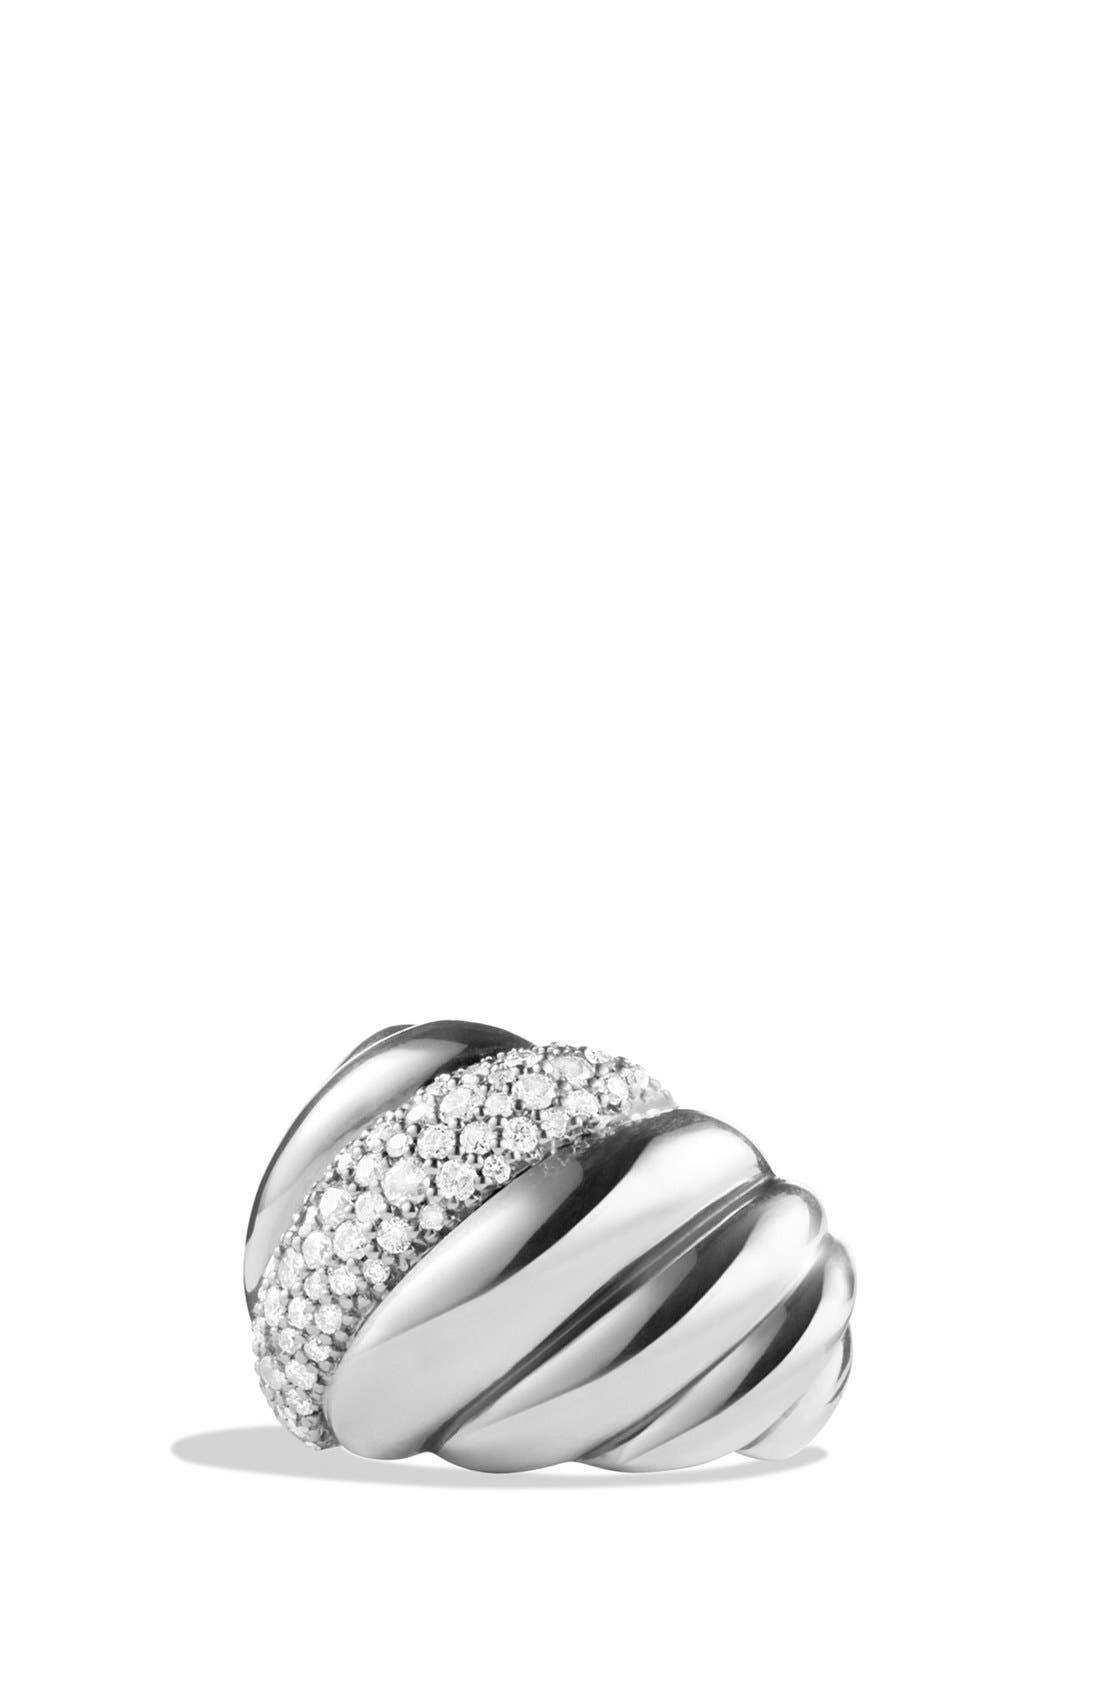 'Hampton Cable' Ring with Diamonds,                             Main thumbnail 1, color,                             Diamond